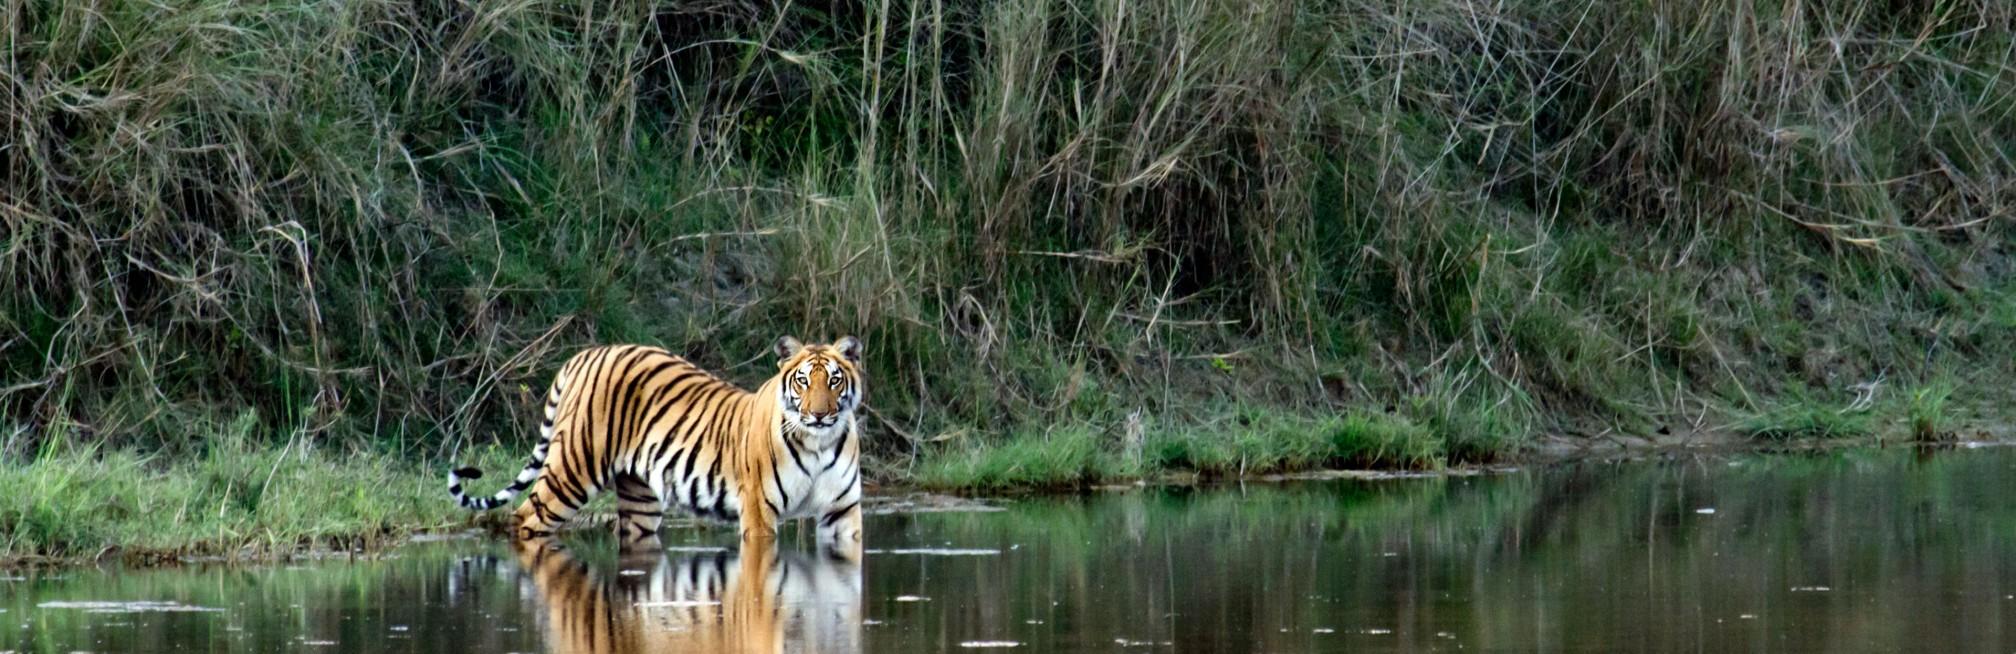 An Indian safari adventure